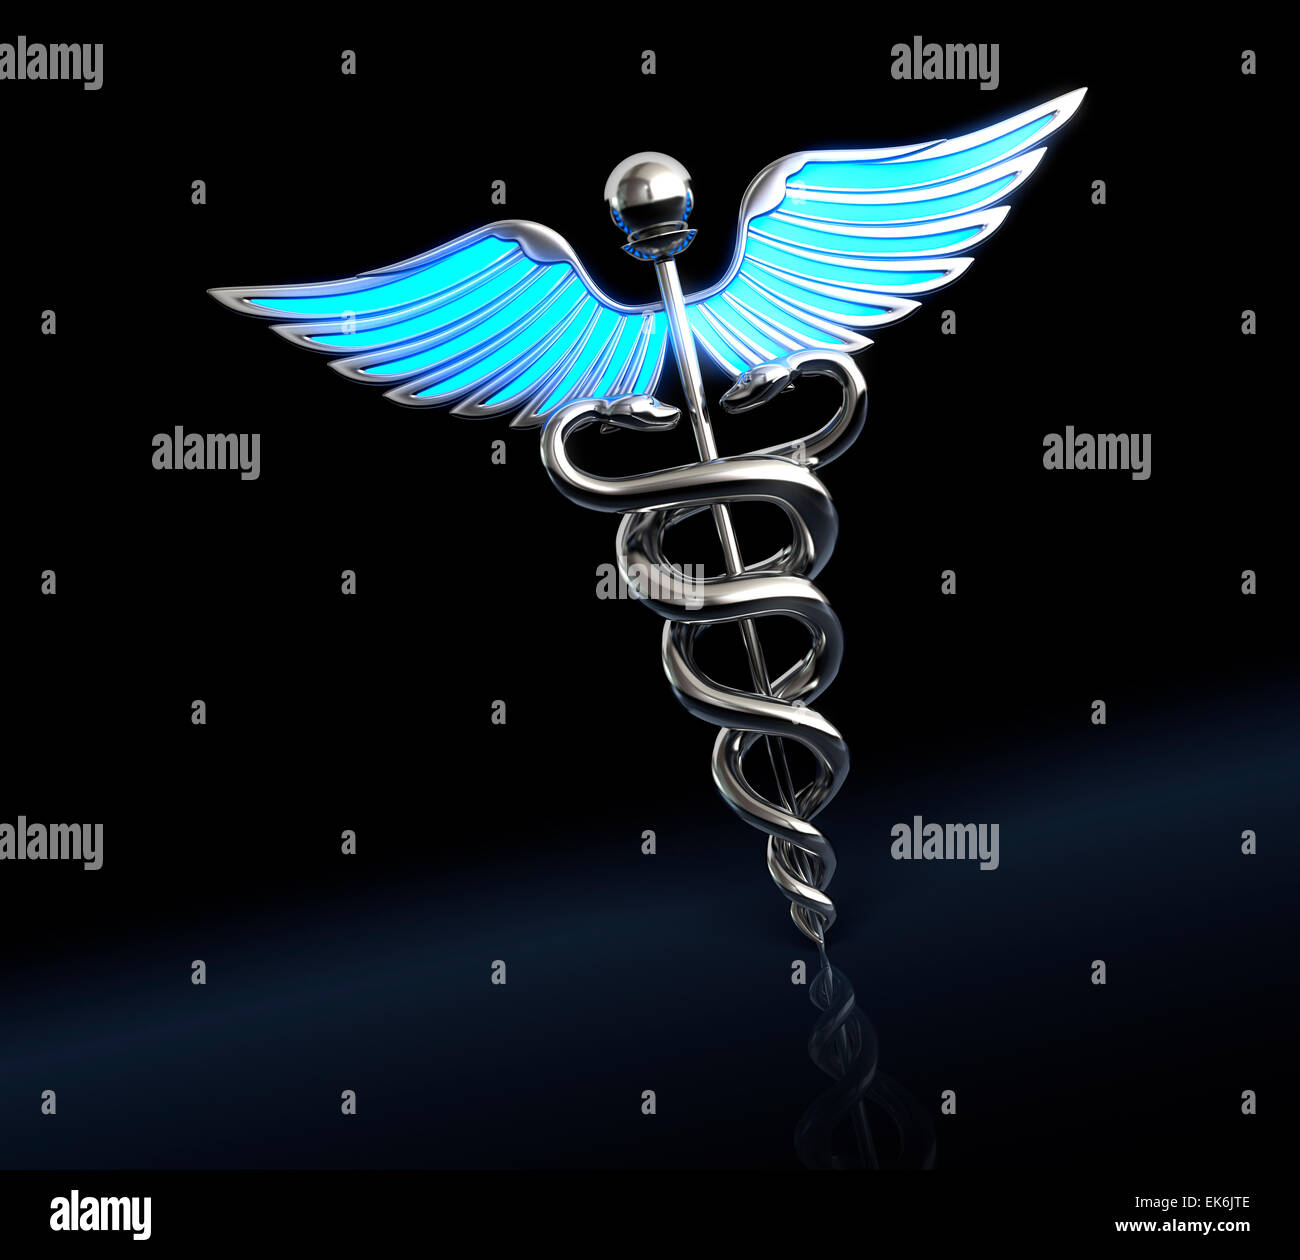 Silver caduceus medical symbol - Stock Image